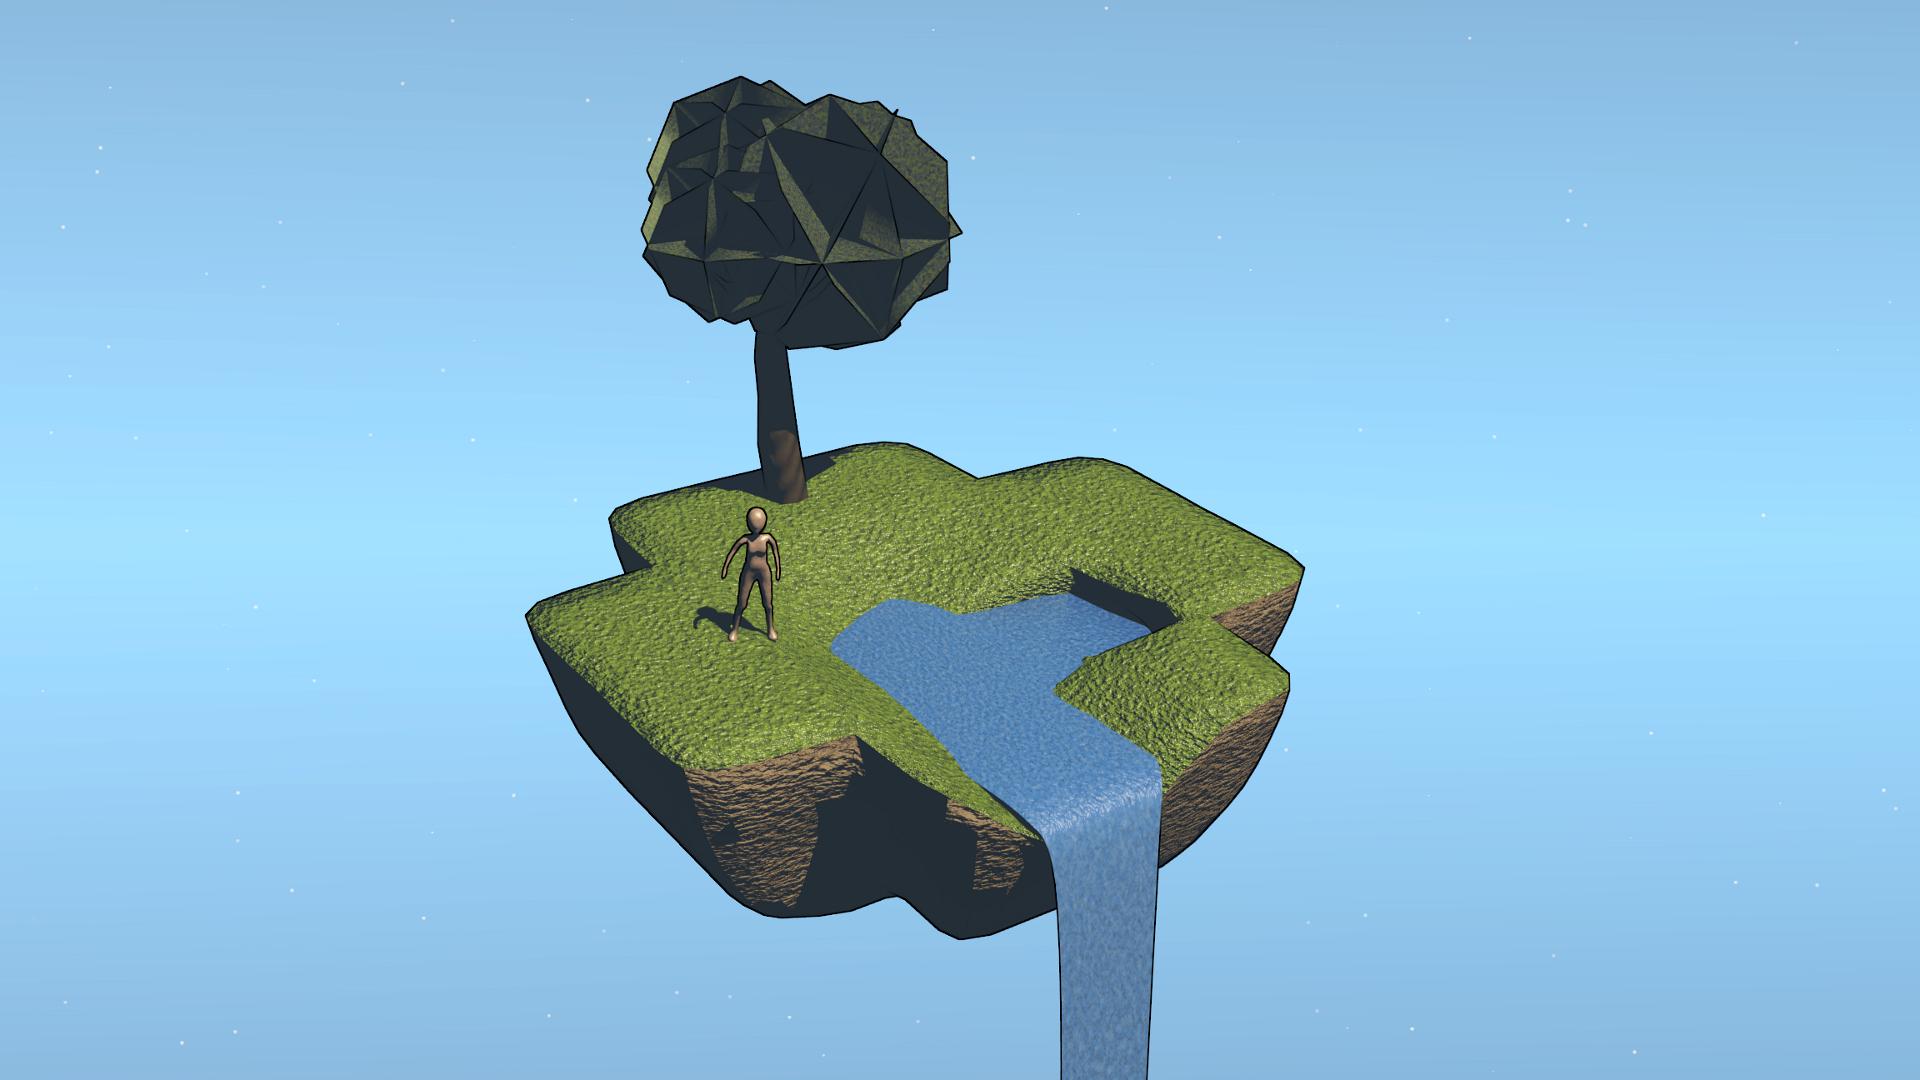 Popular Wallpaper Minecraft Simple - simple_sky_island_by_jetrunner-d6tkzuz  Graphic_976567.jpg